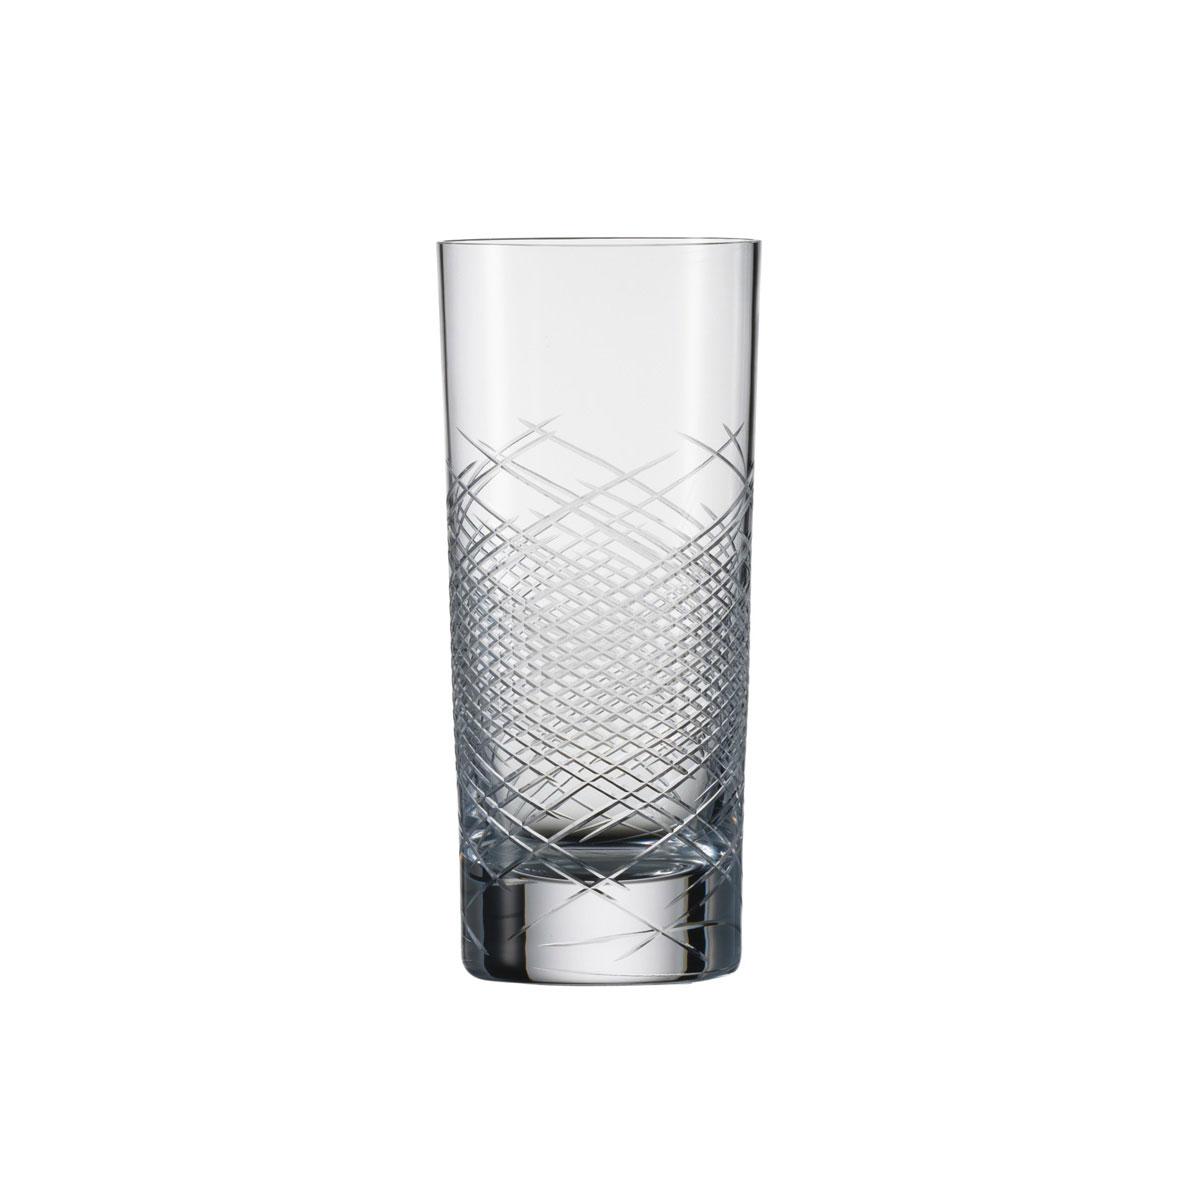 Schott Zwiesel Tritan Crystal, 1872 Charles Schumann Hommage Comete Longdrink Large, Single